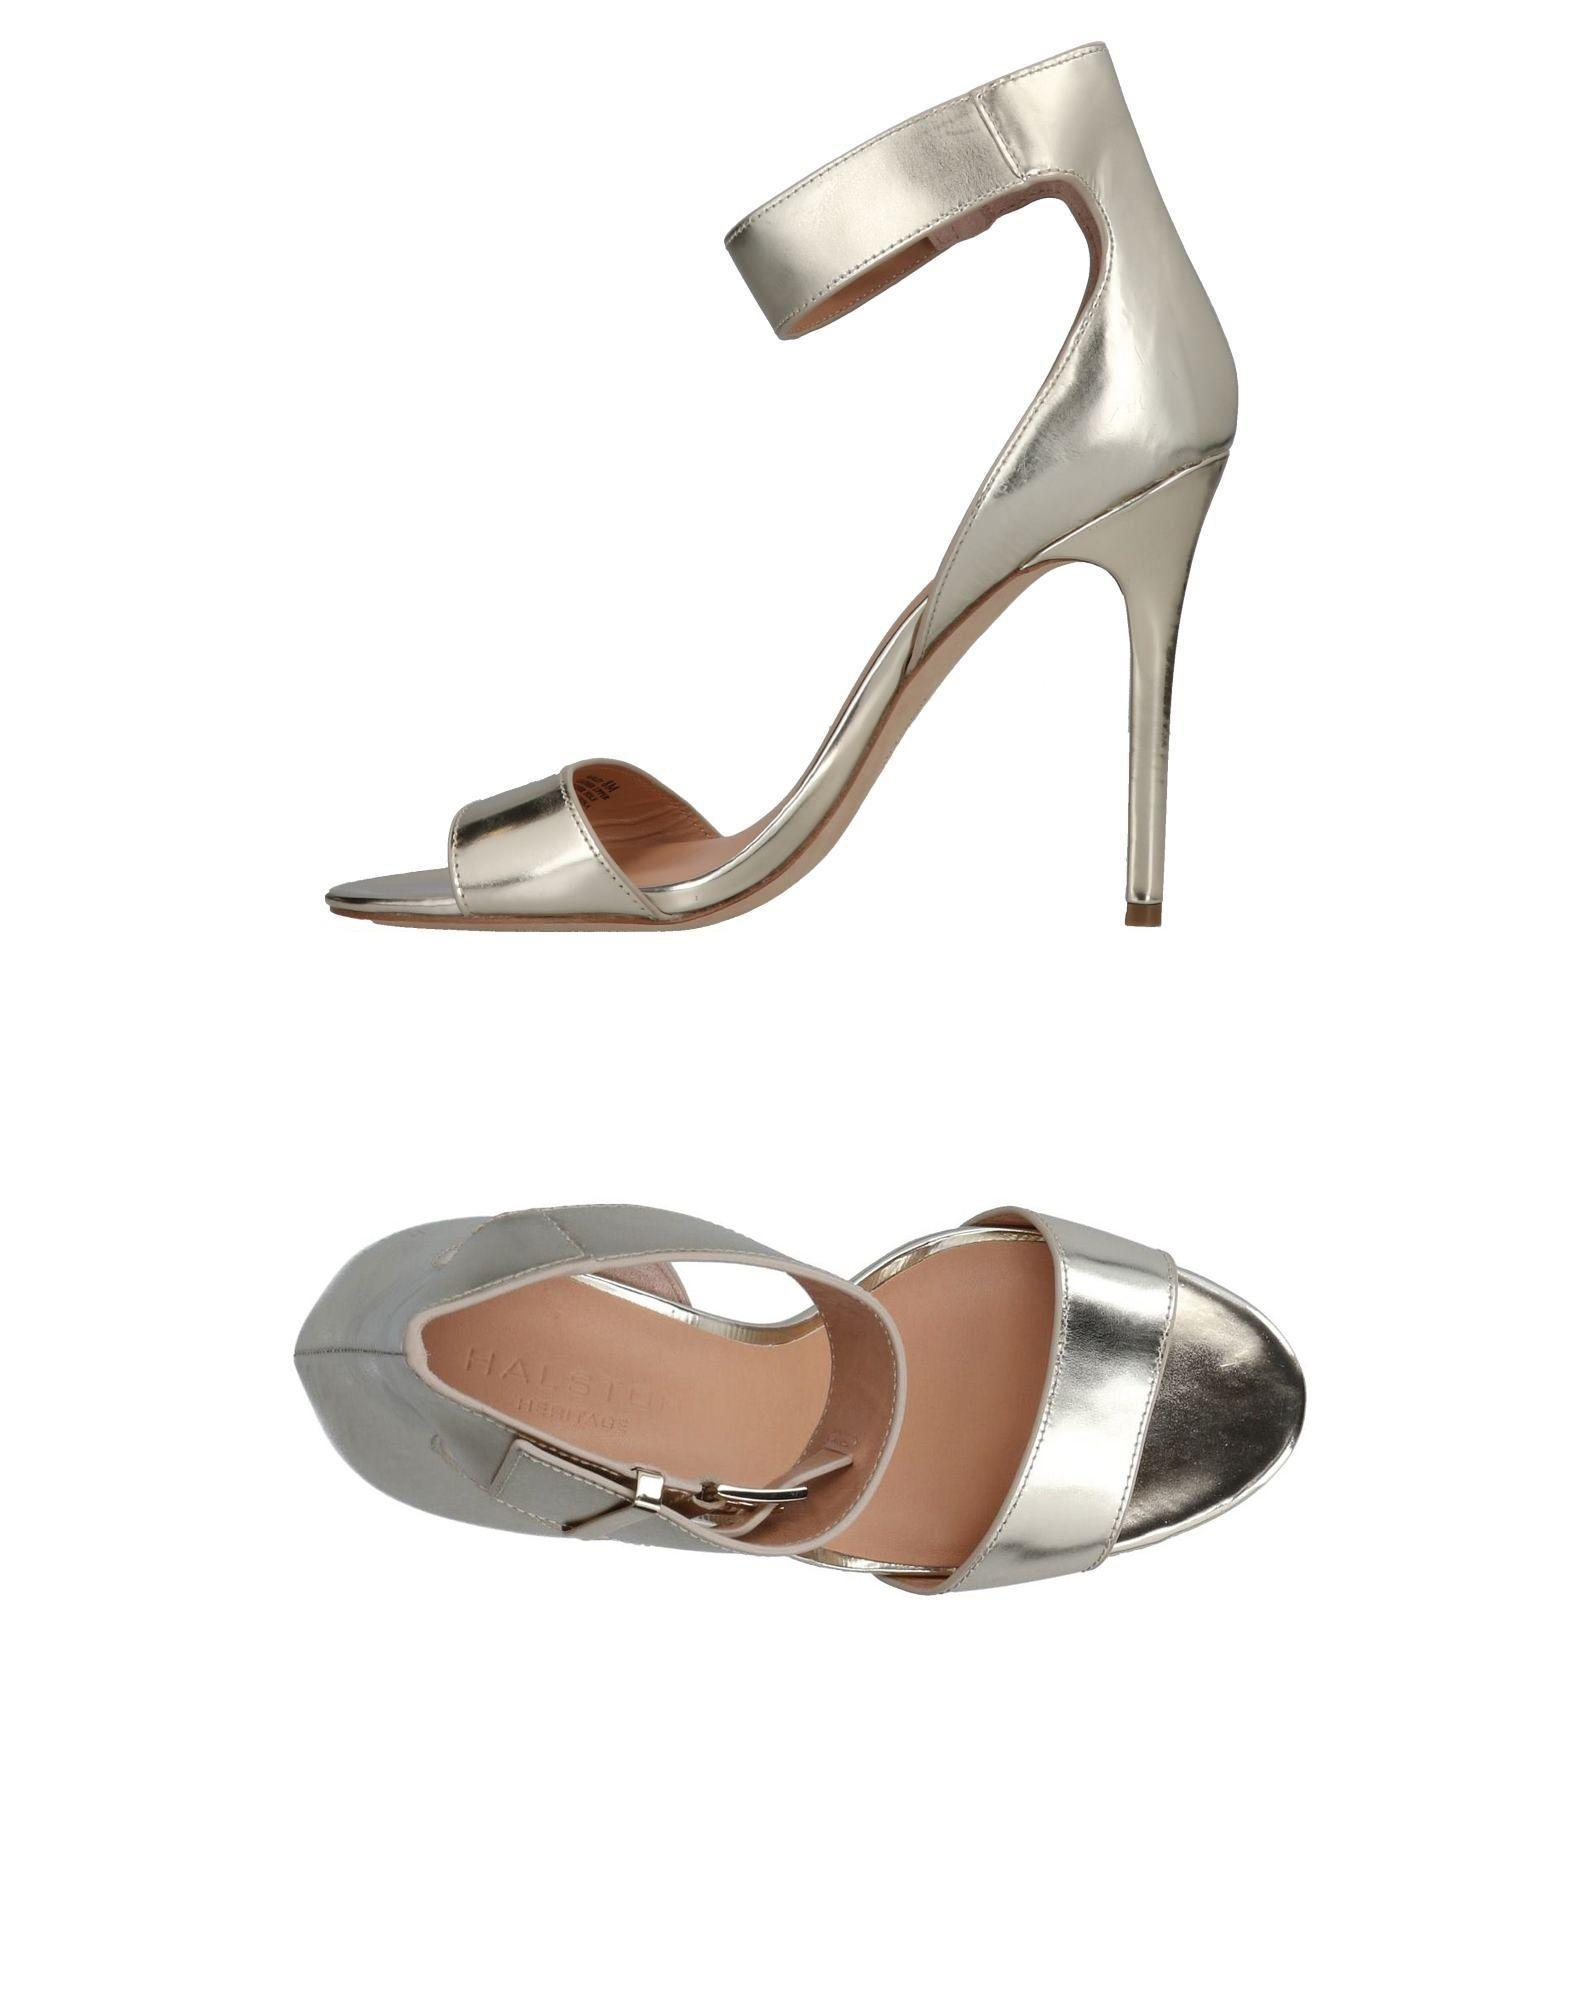 Halston Heritage Sandals In Platinum